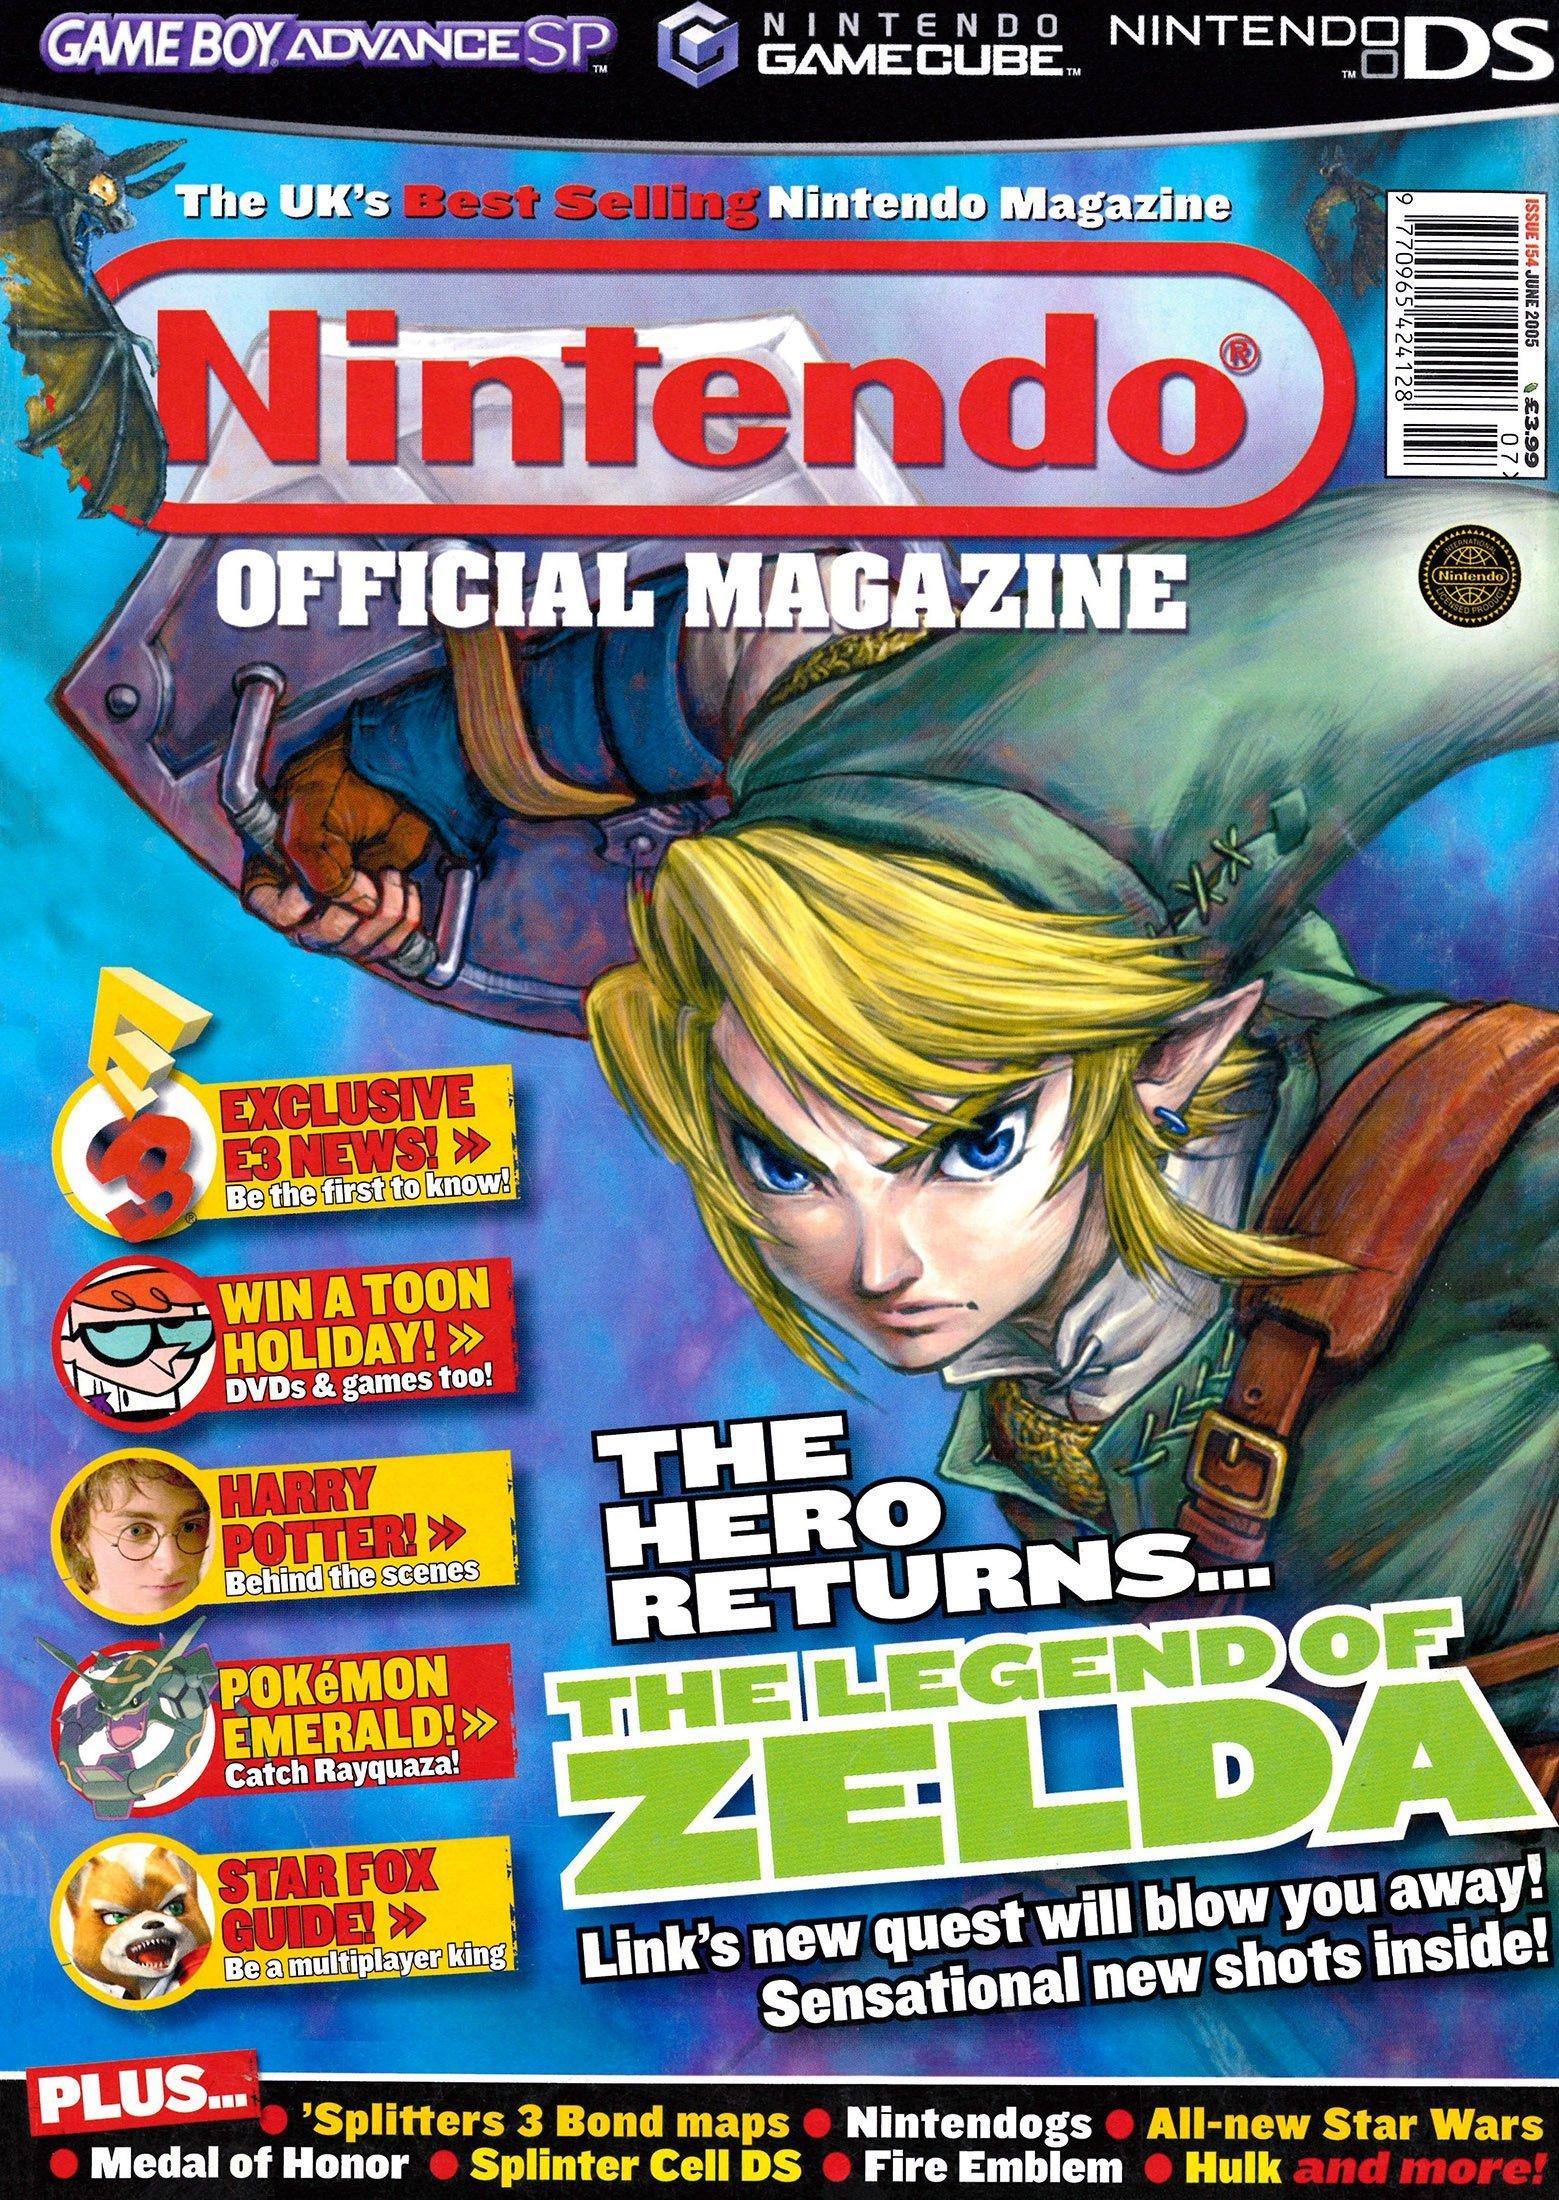 Nintendo Official Magazine 154 (June 2005)